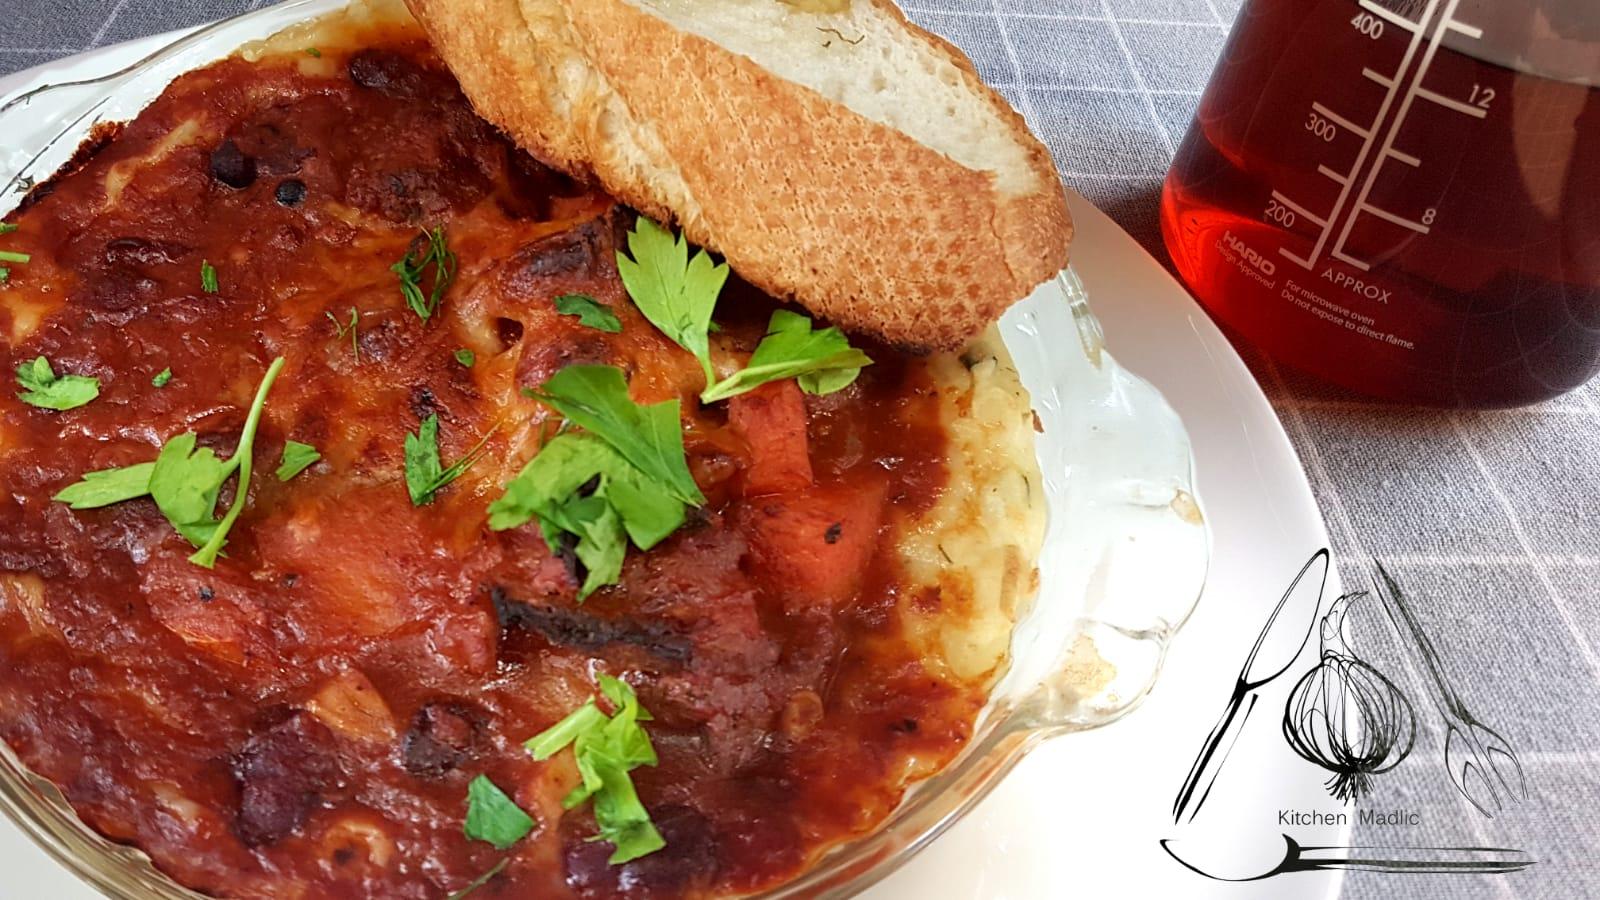 紅酒蔬菜燴牛肉薯蓉。(Kitchen Madlic提供)